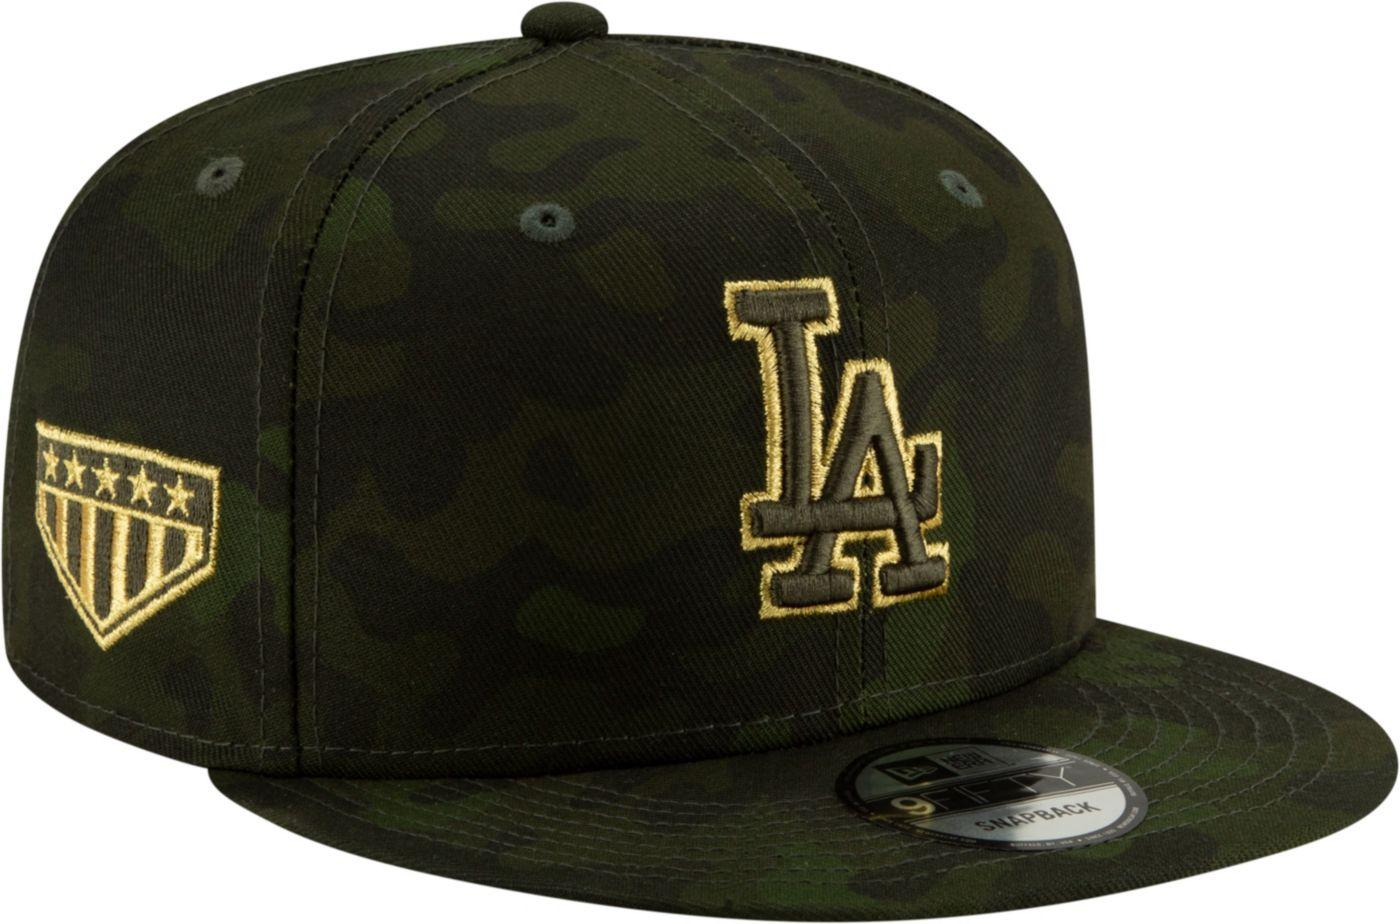 New Era Men's Los Angeles Dodgers 9Fifty Armed Forces Adjustable Snapback Hat